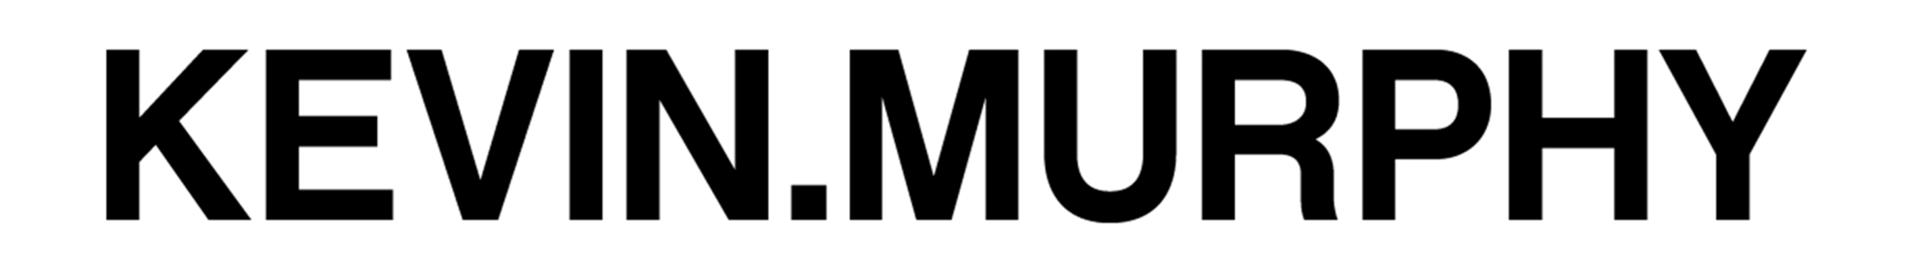 logo-kevin-murphy.png